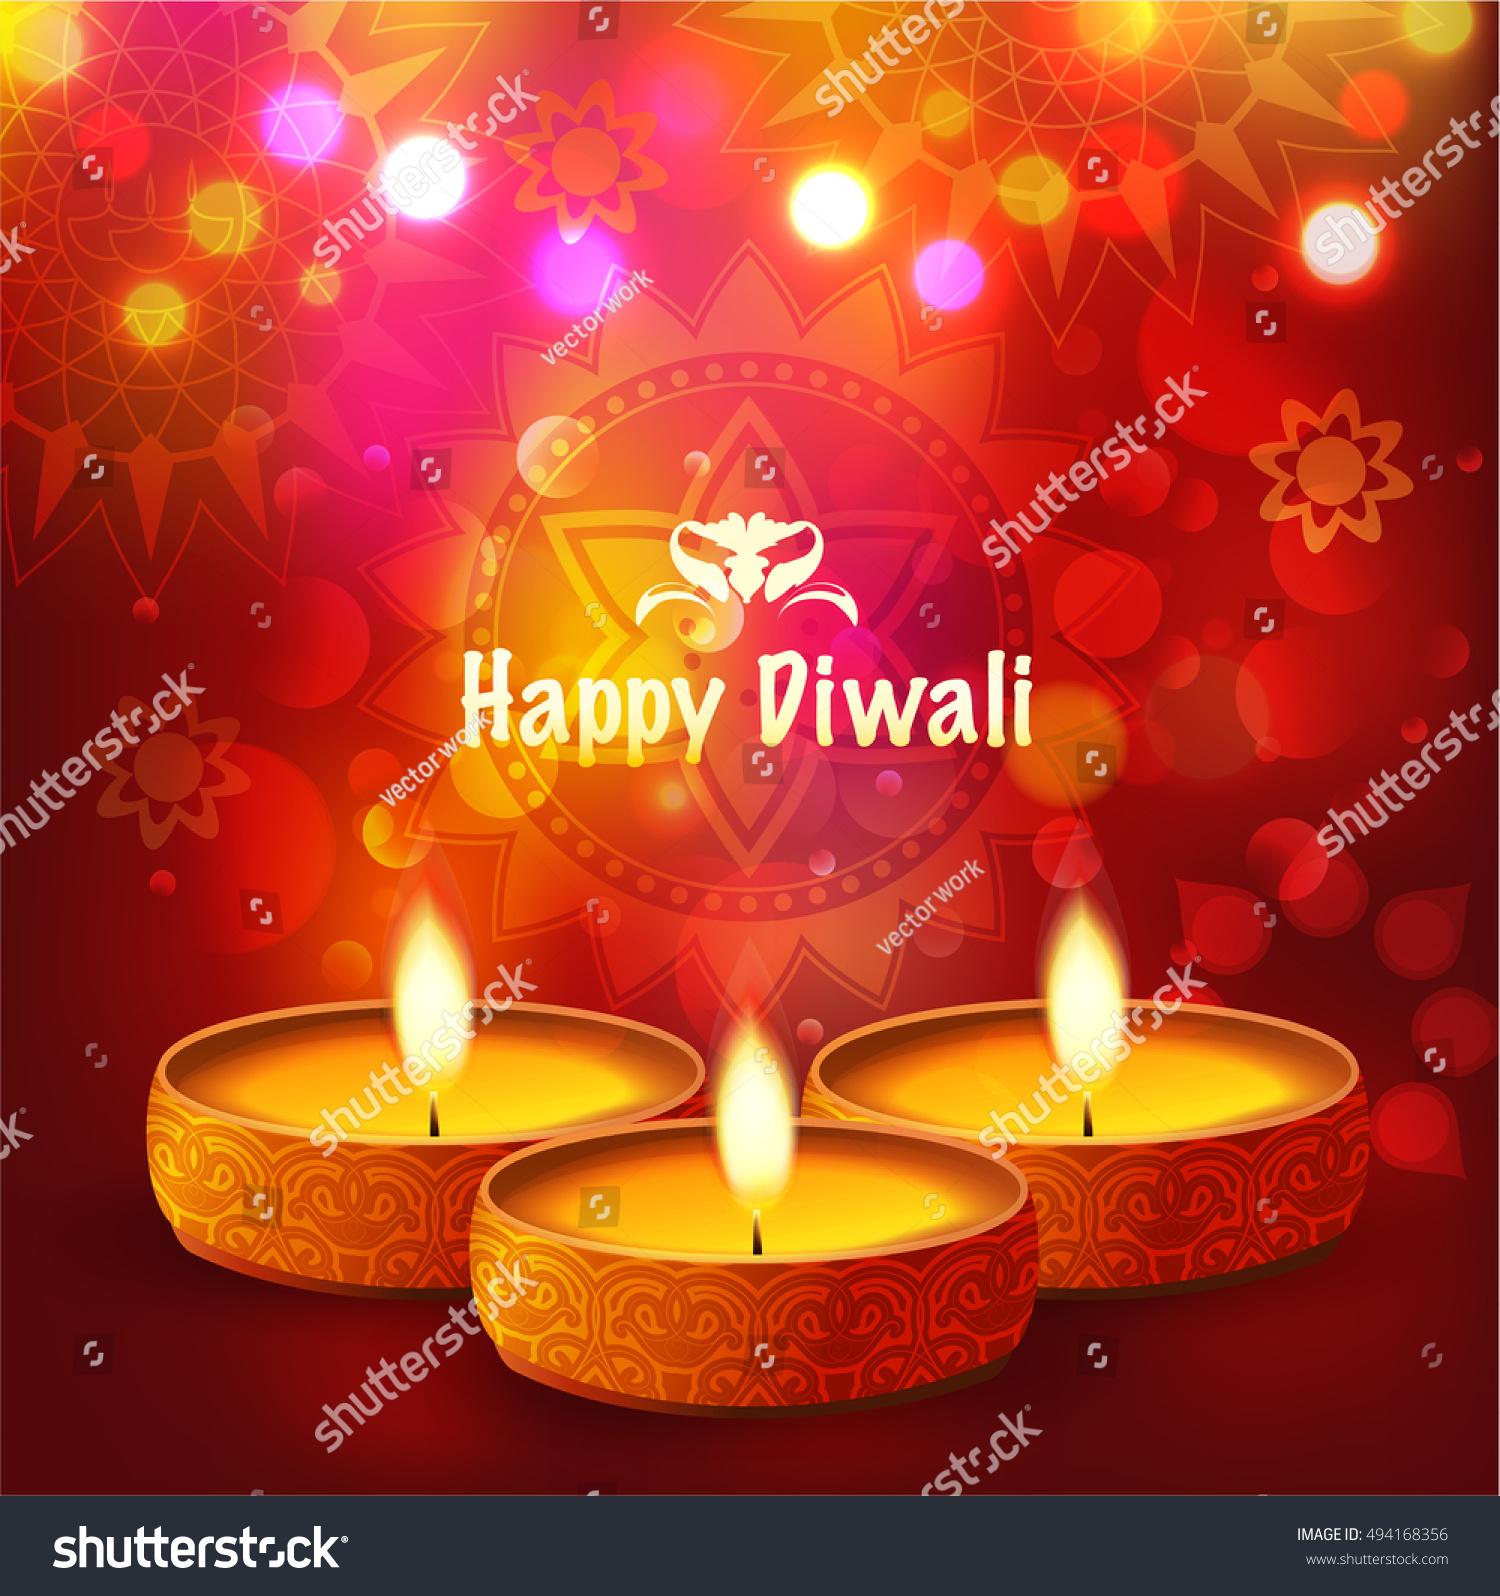 Festival Lights Diwali Greeting Card Background Stock Vector